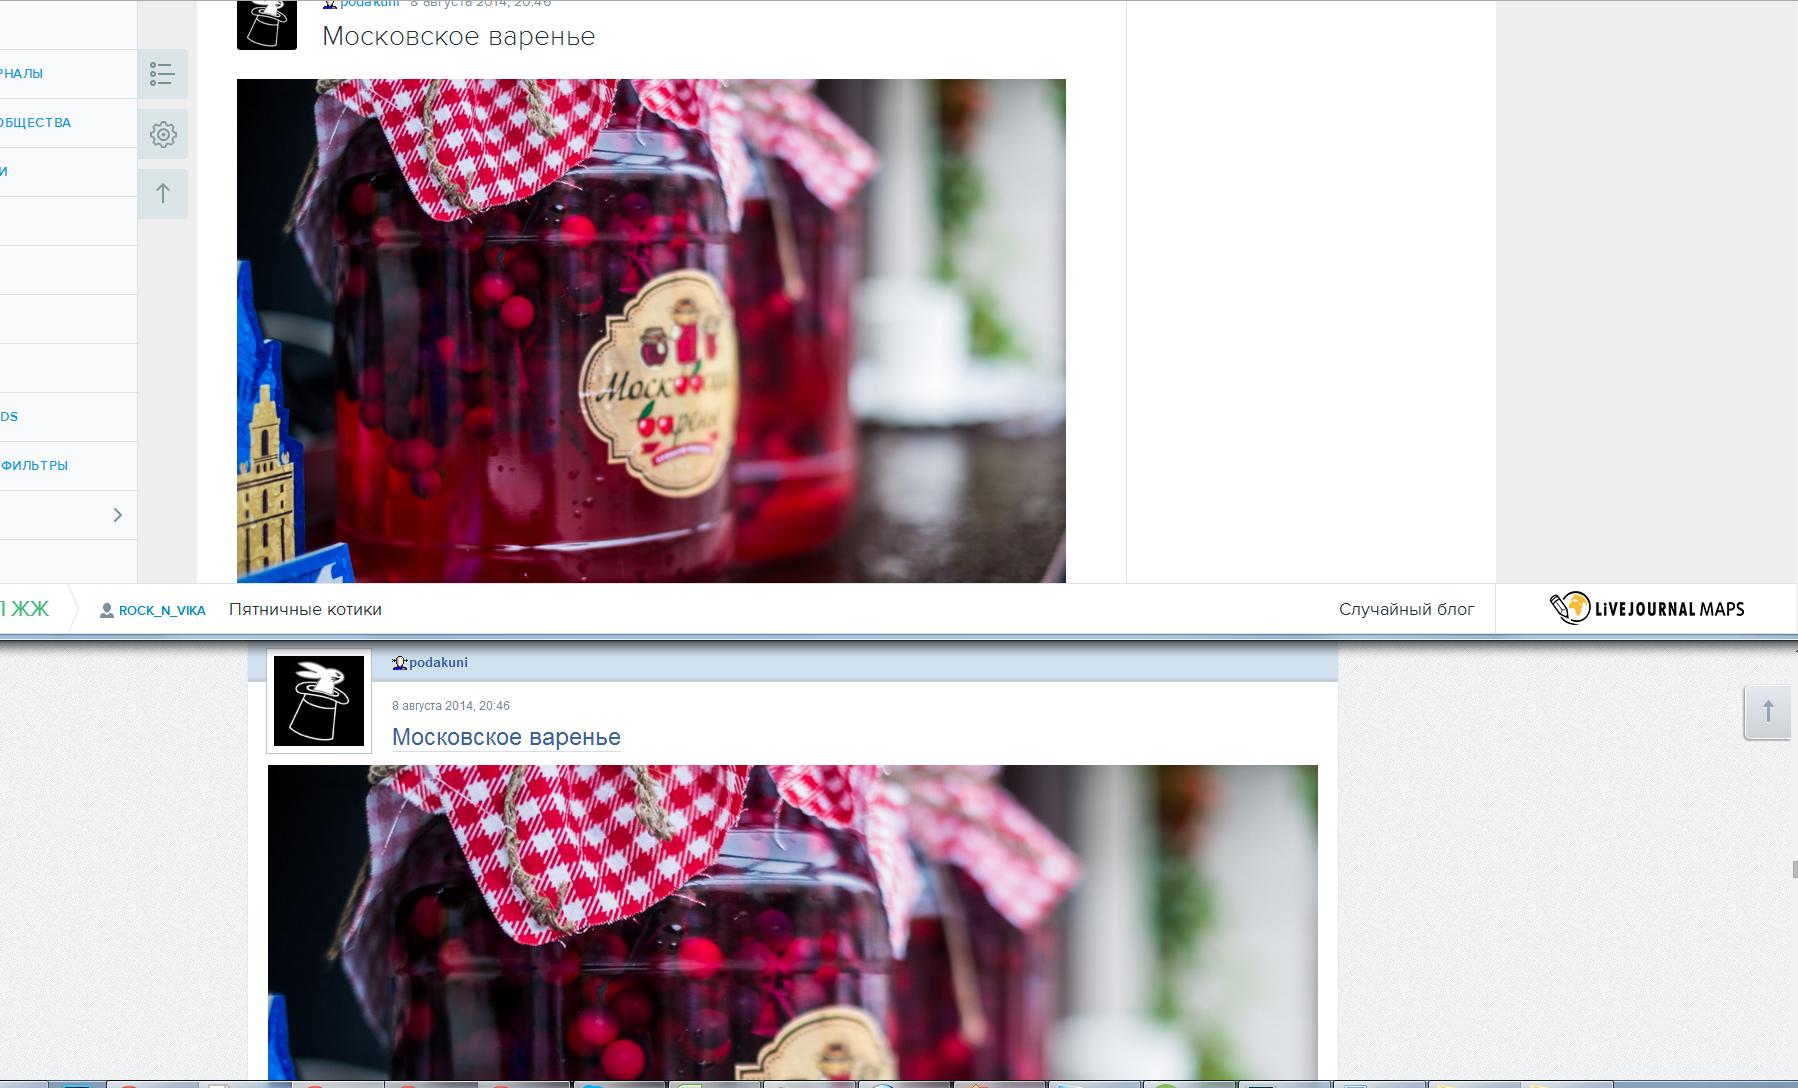 2014-08-09 12-33-13 Скриншот экрана